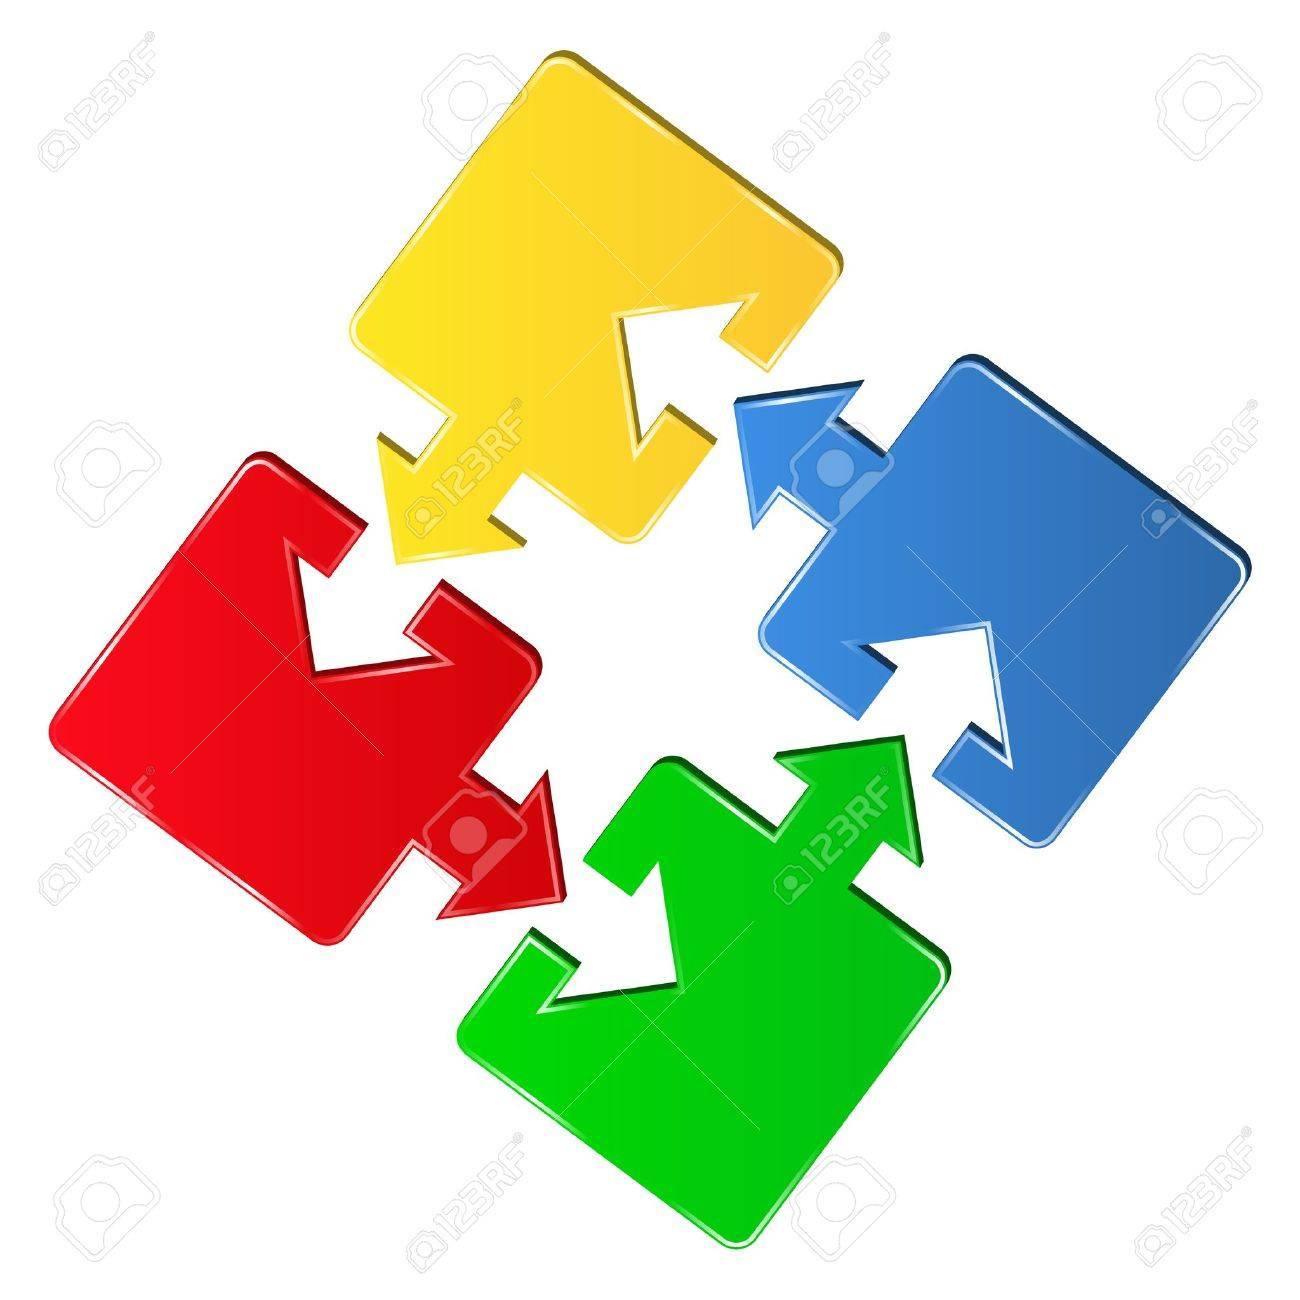 puzzle pieces with arrows Stock Vector - 10428444